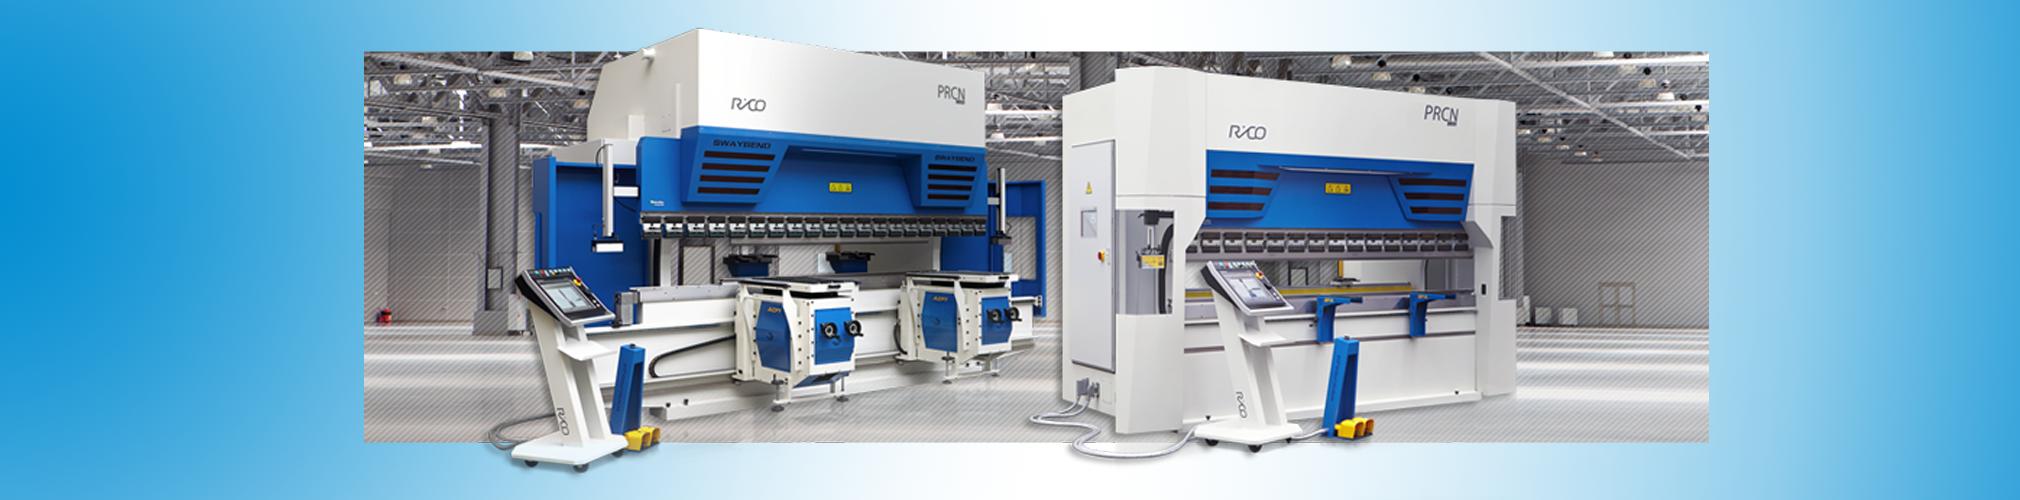 Metall metaal plaatbewerking machines industrieel plaatbewerkingsmachine plaatbewerkingsmachines pijpenbuiger